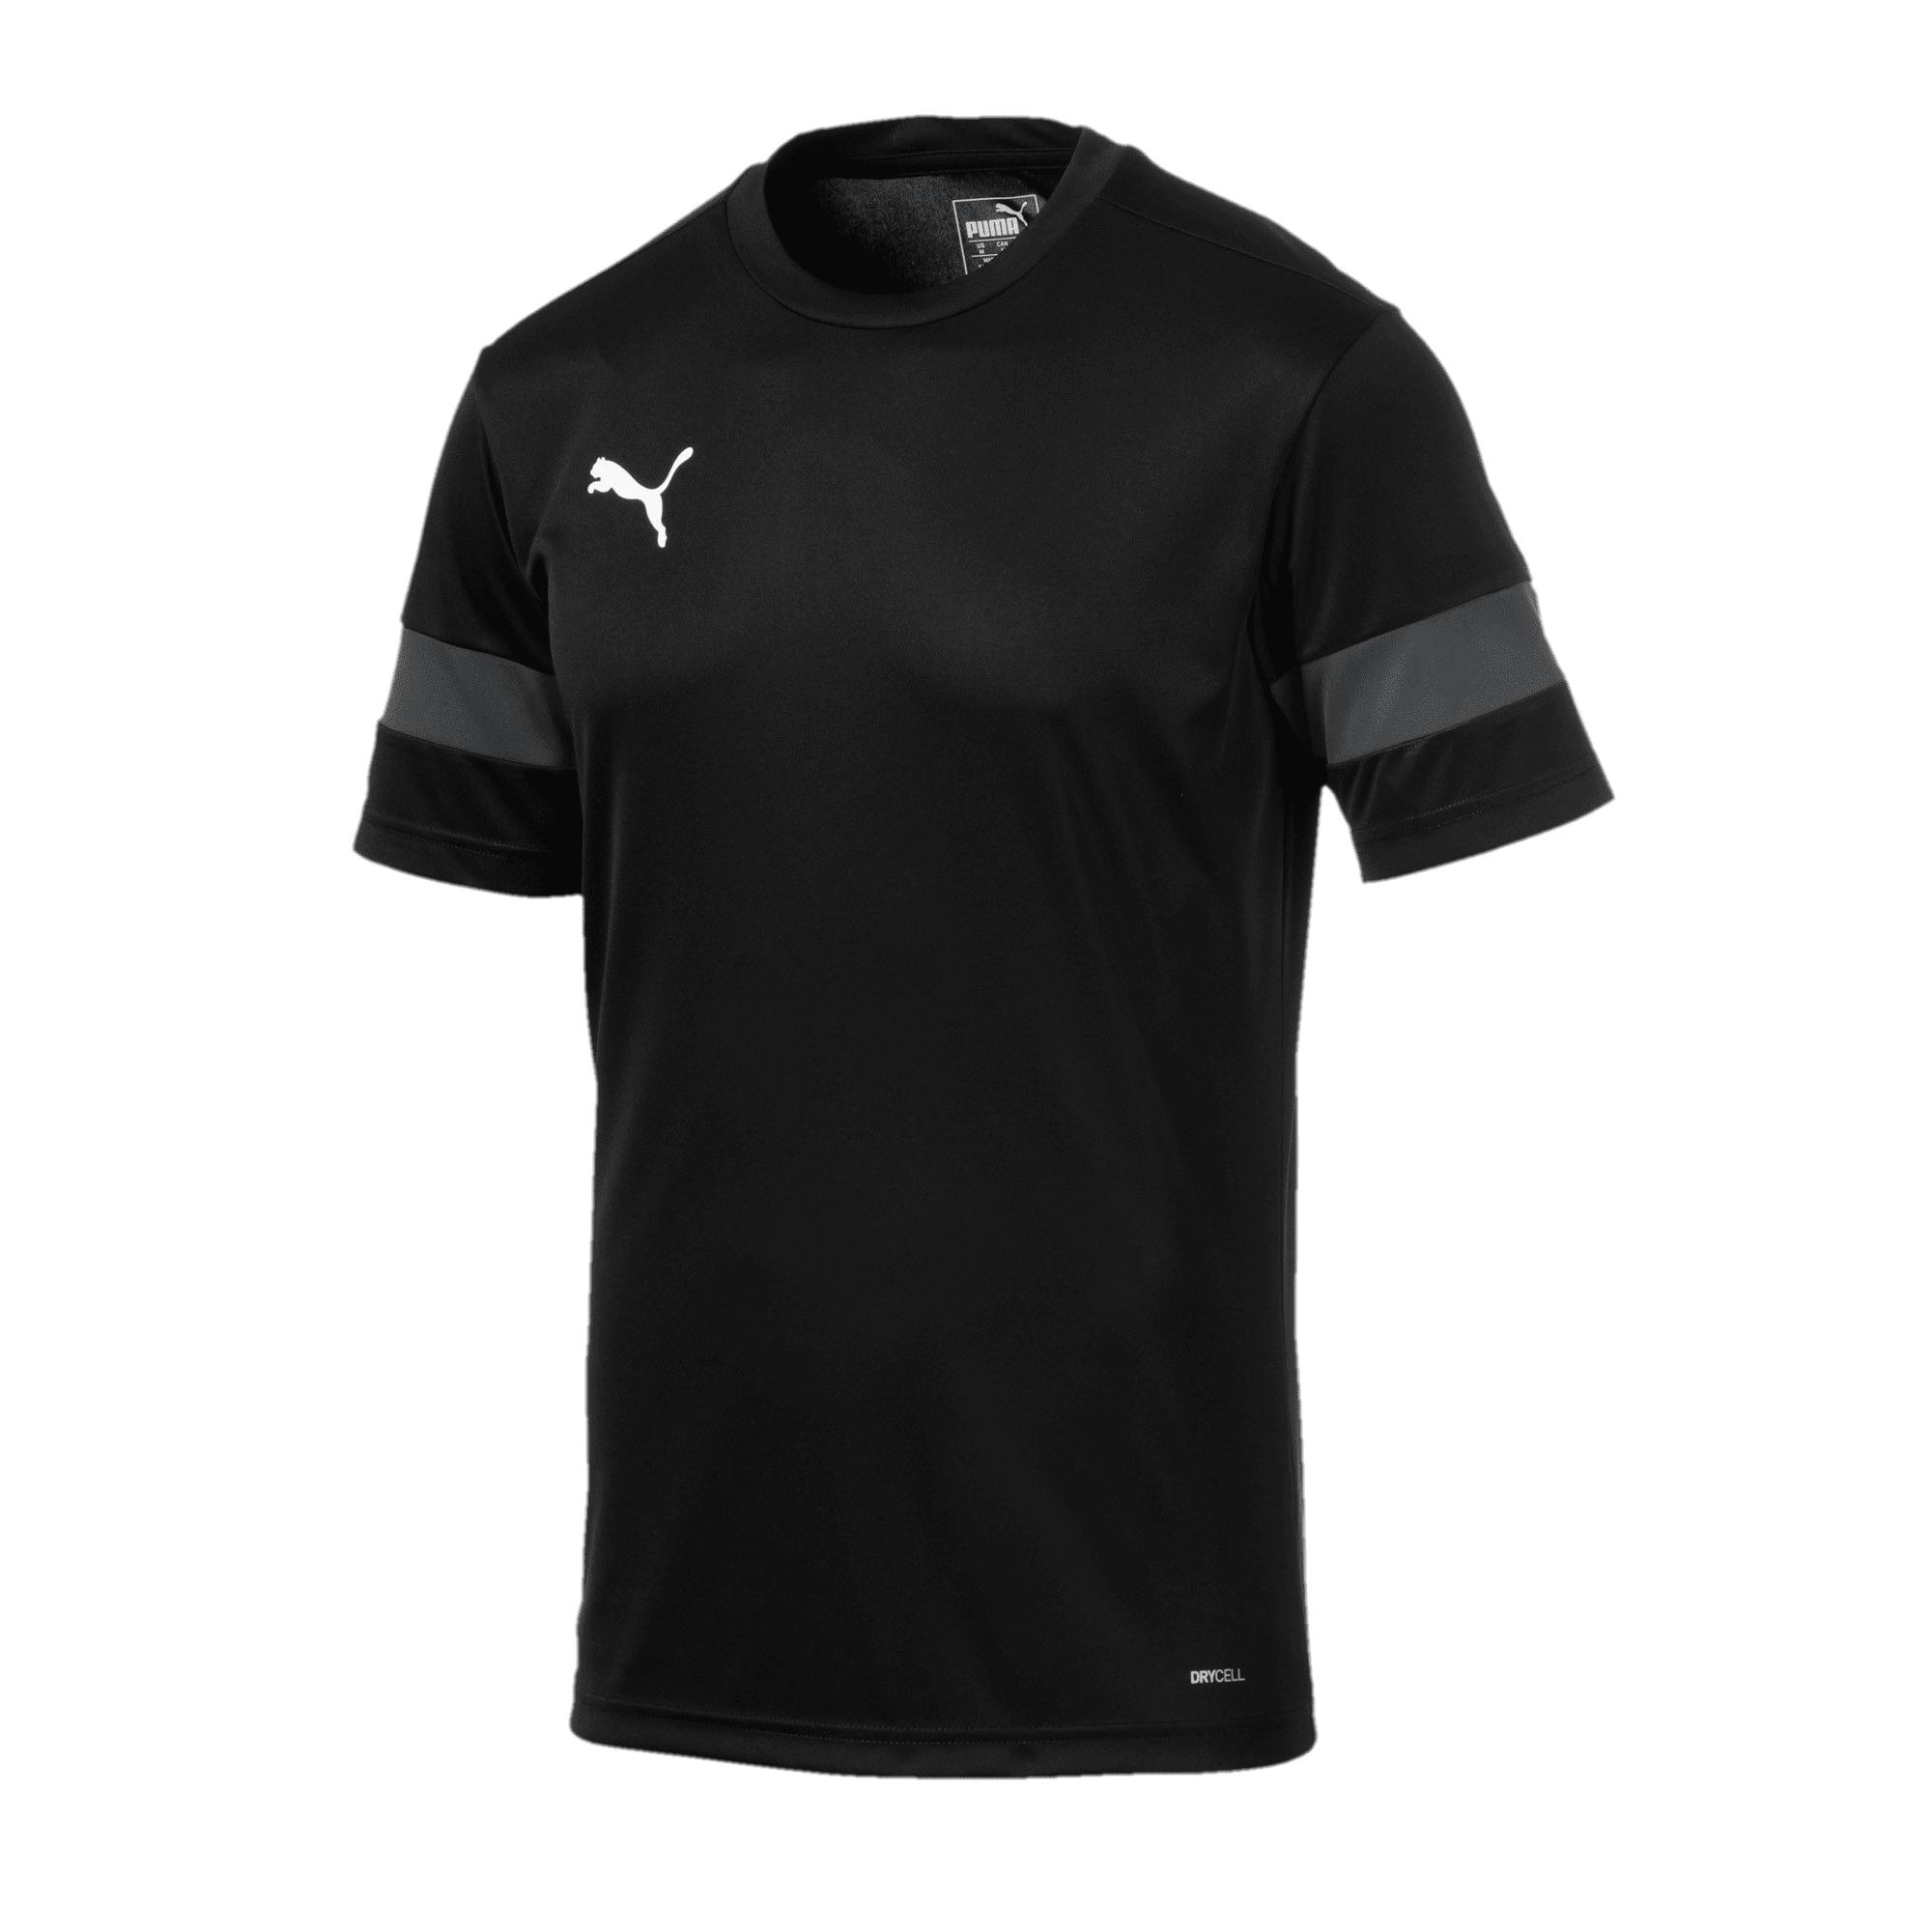 Thumbnail 4 of Trainingsshirt voor heren, Puma Black-Asphalt, medium